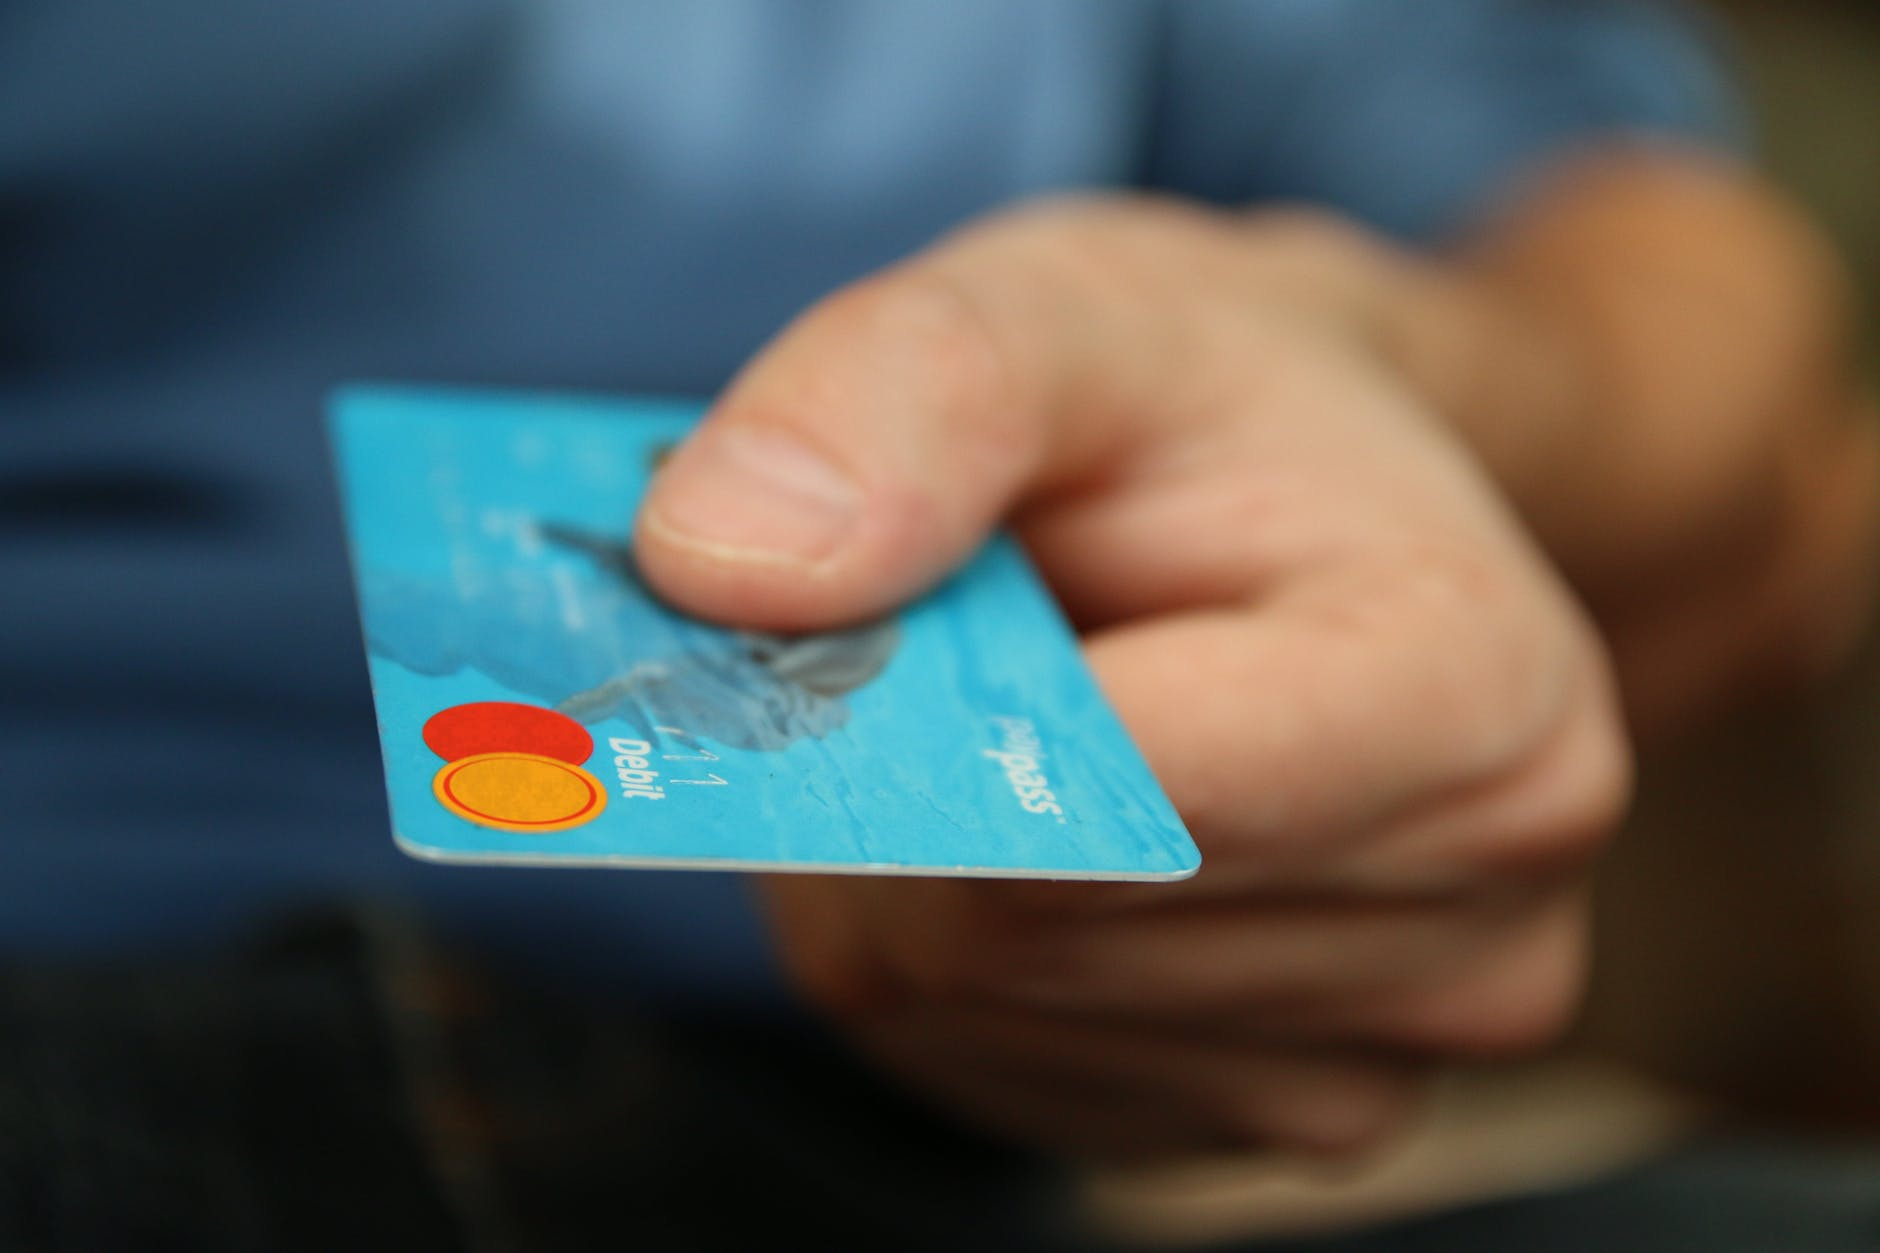 Shopping med kreditkort